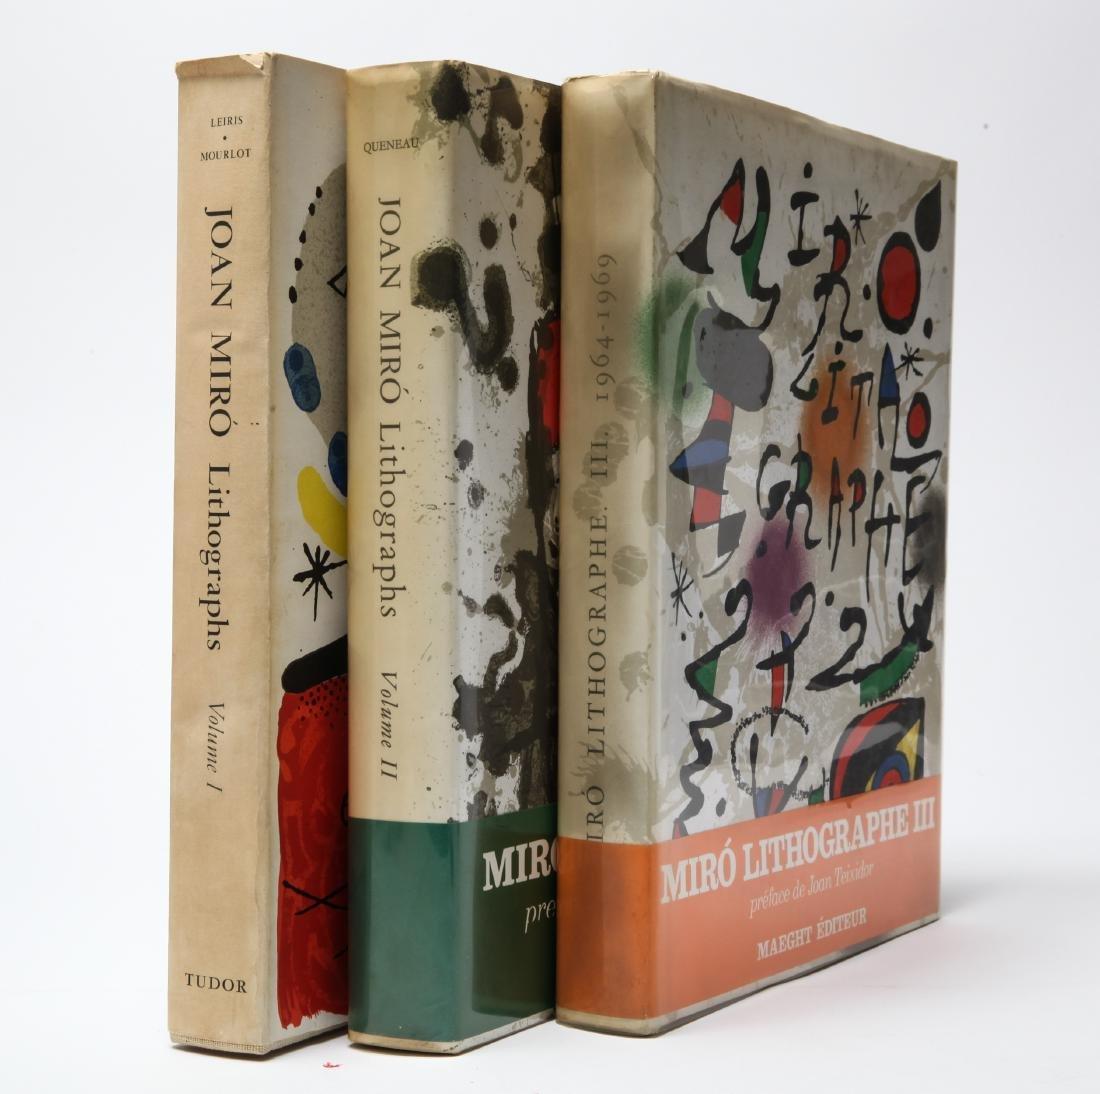 Joan Miro Lithograph Catalogue Raisonne, 3 Volumes